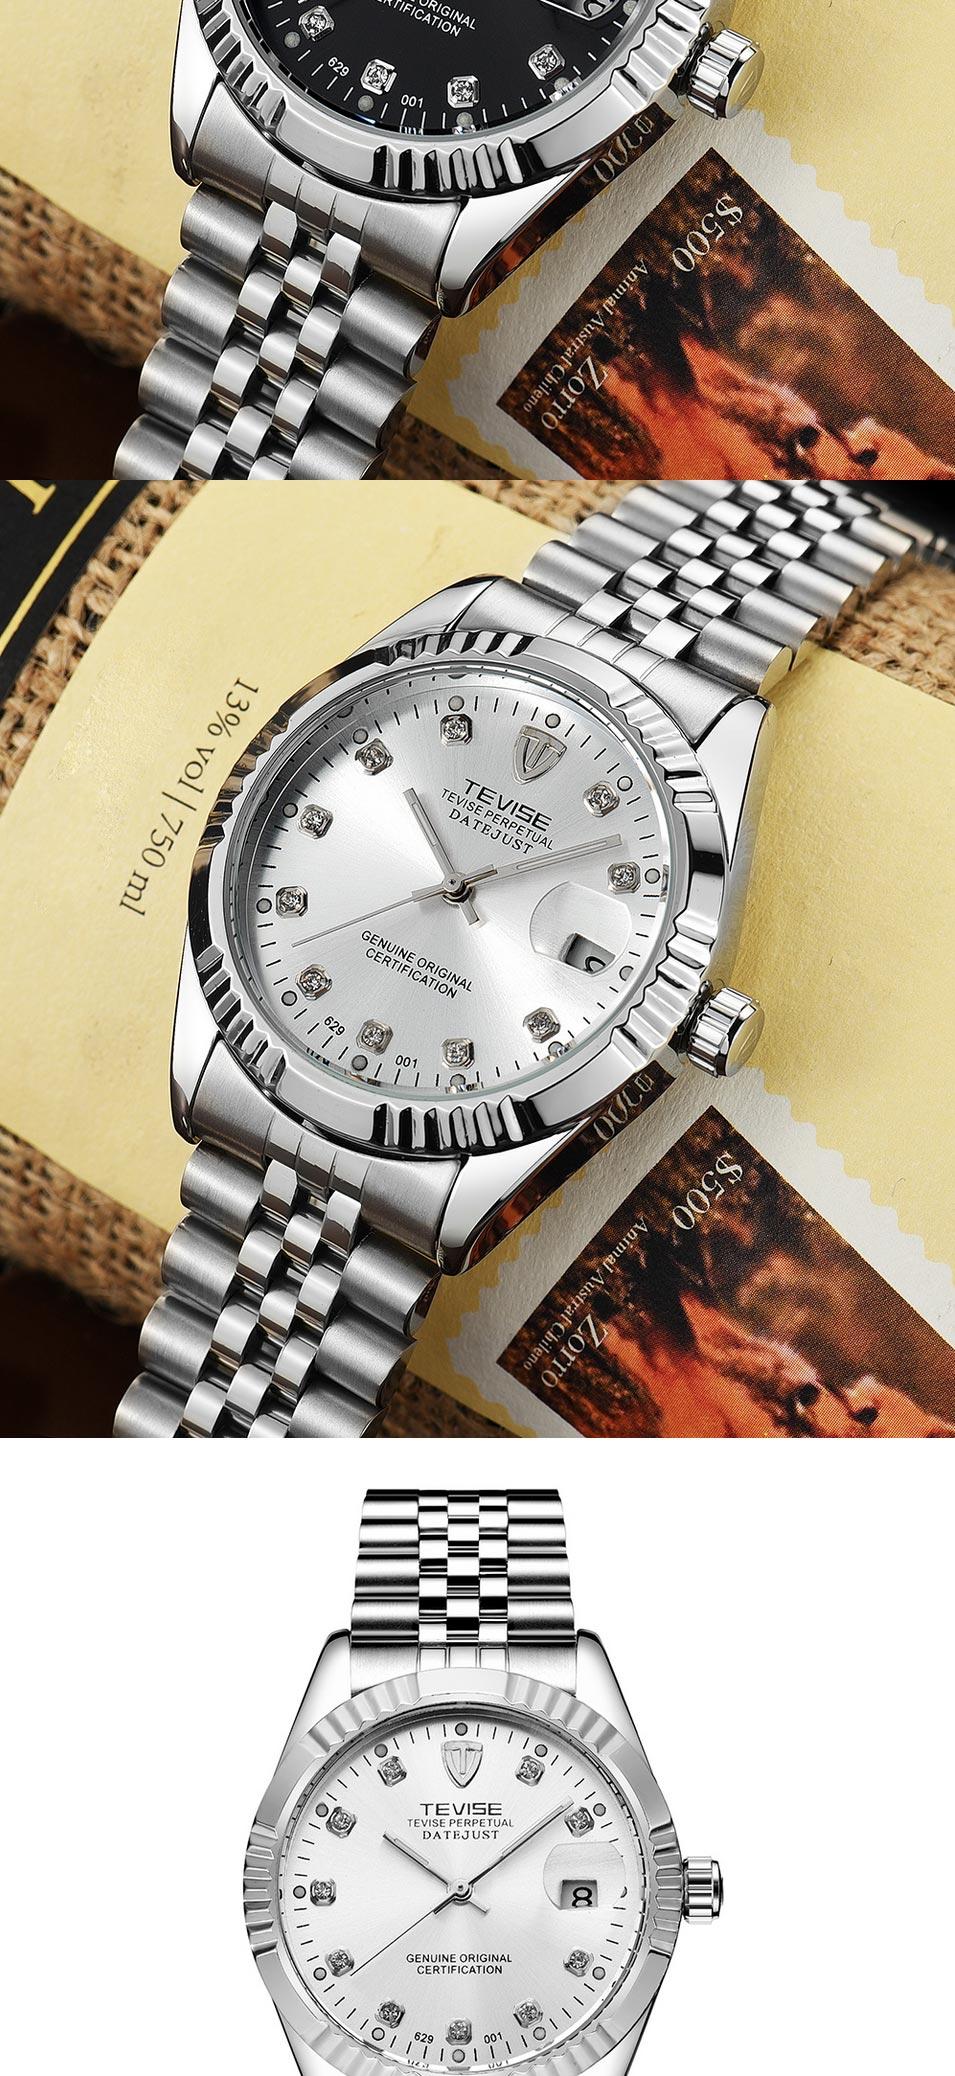 TEVISE-Men-Brand-Watch-F-04